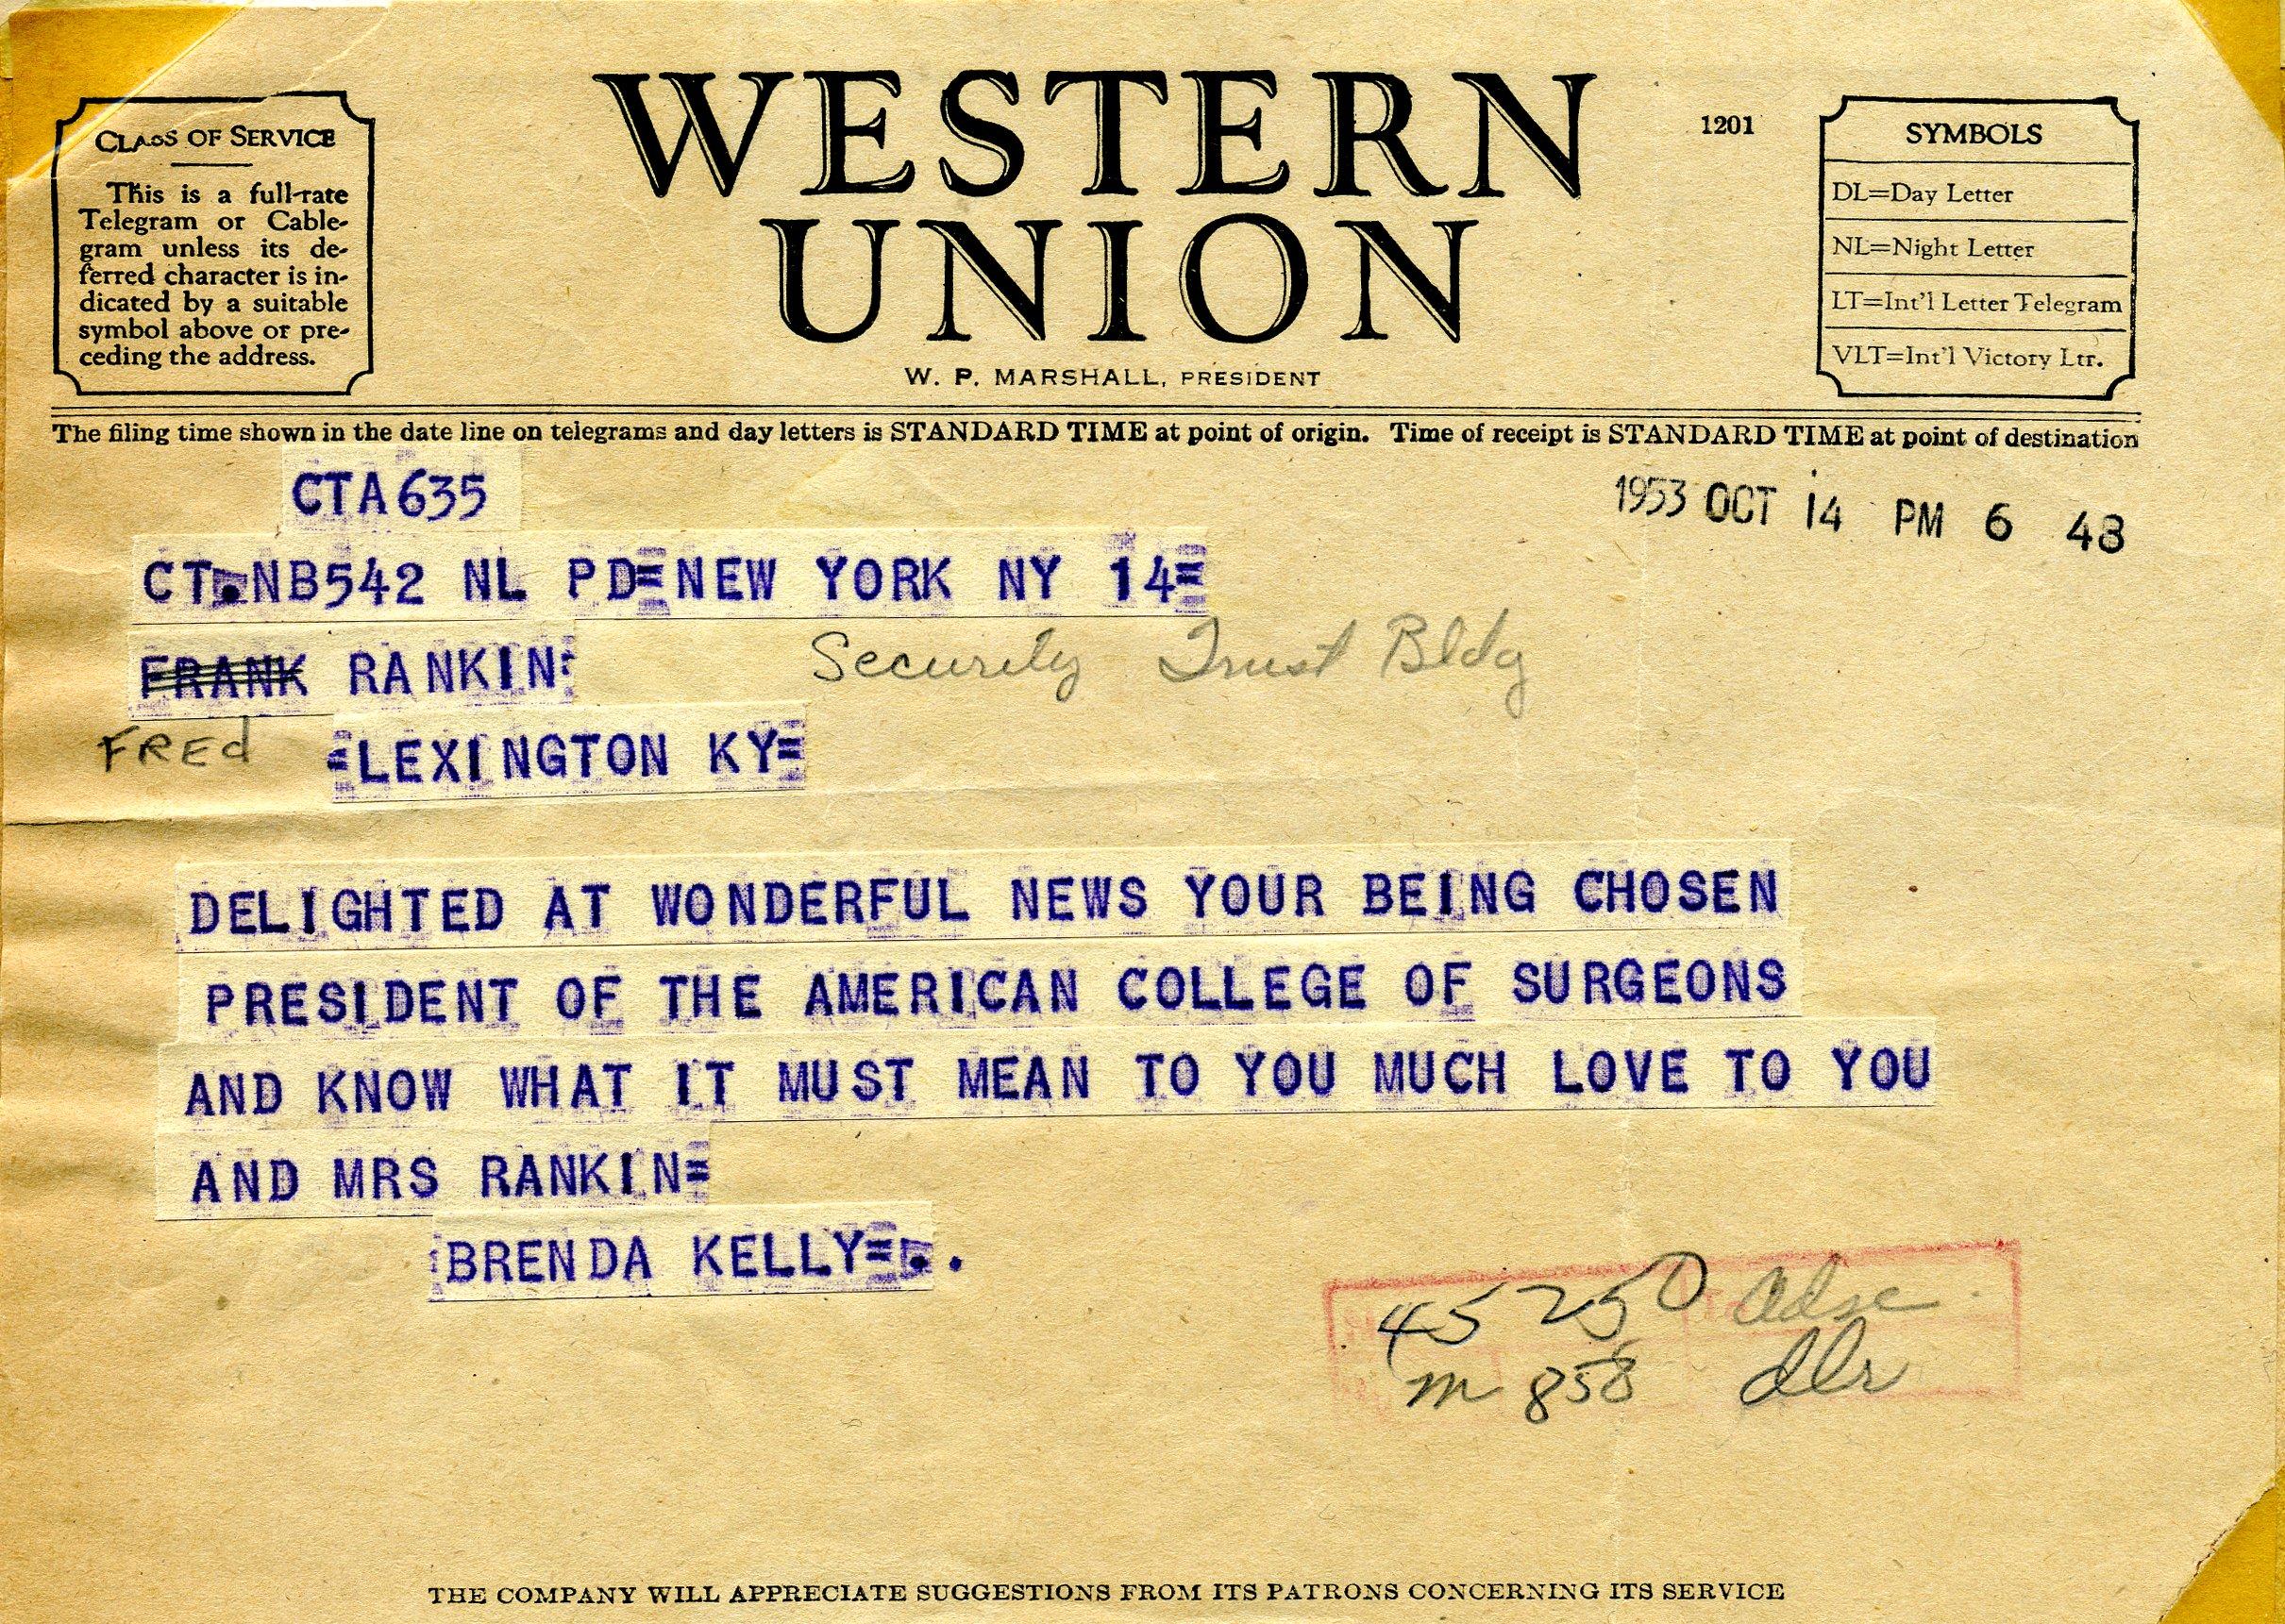 western union telegram from brenda kelly new york new york to